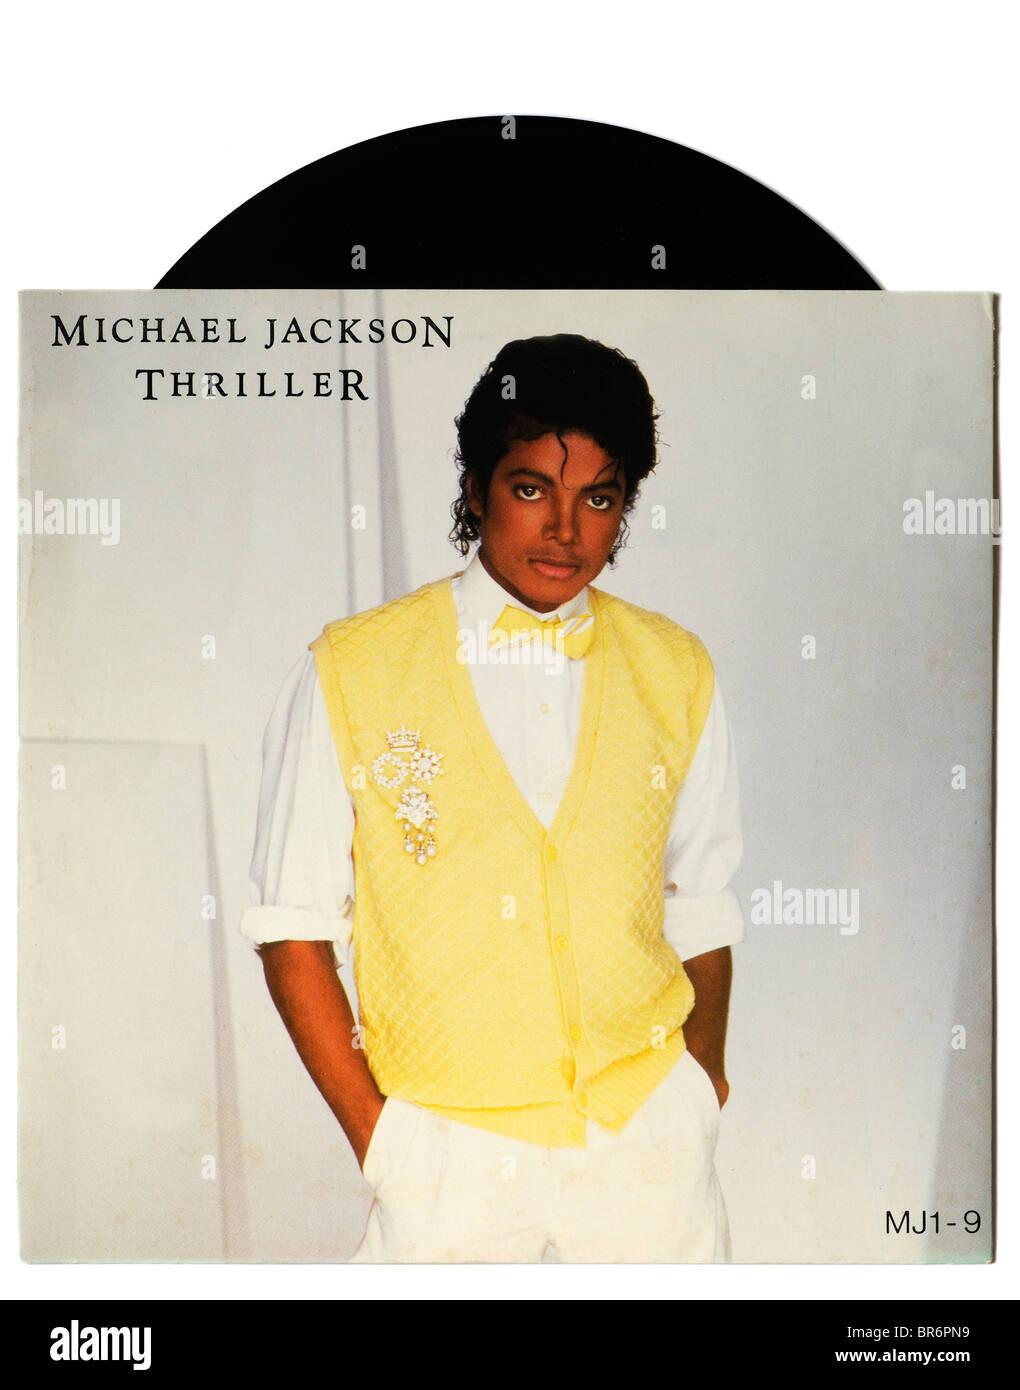 Michael Jackson Thriller sola Imagen De Stock